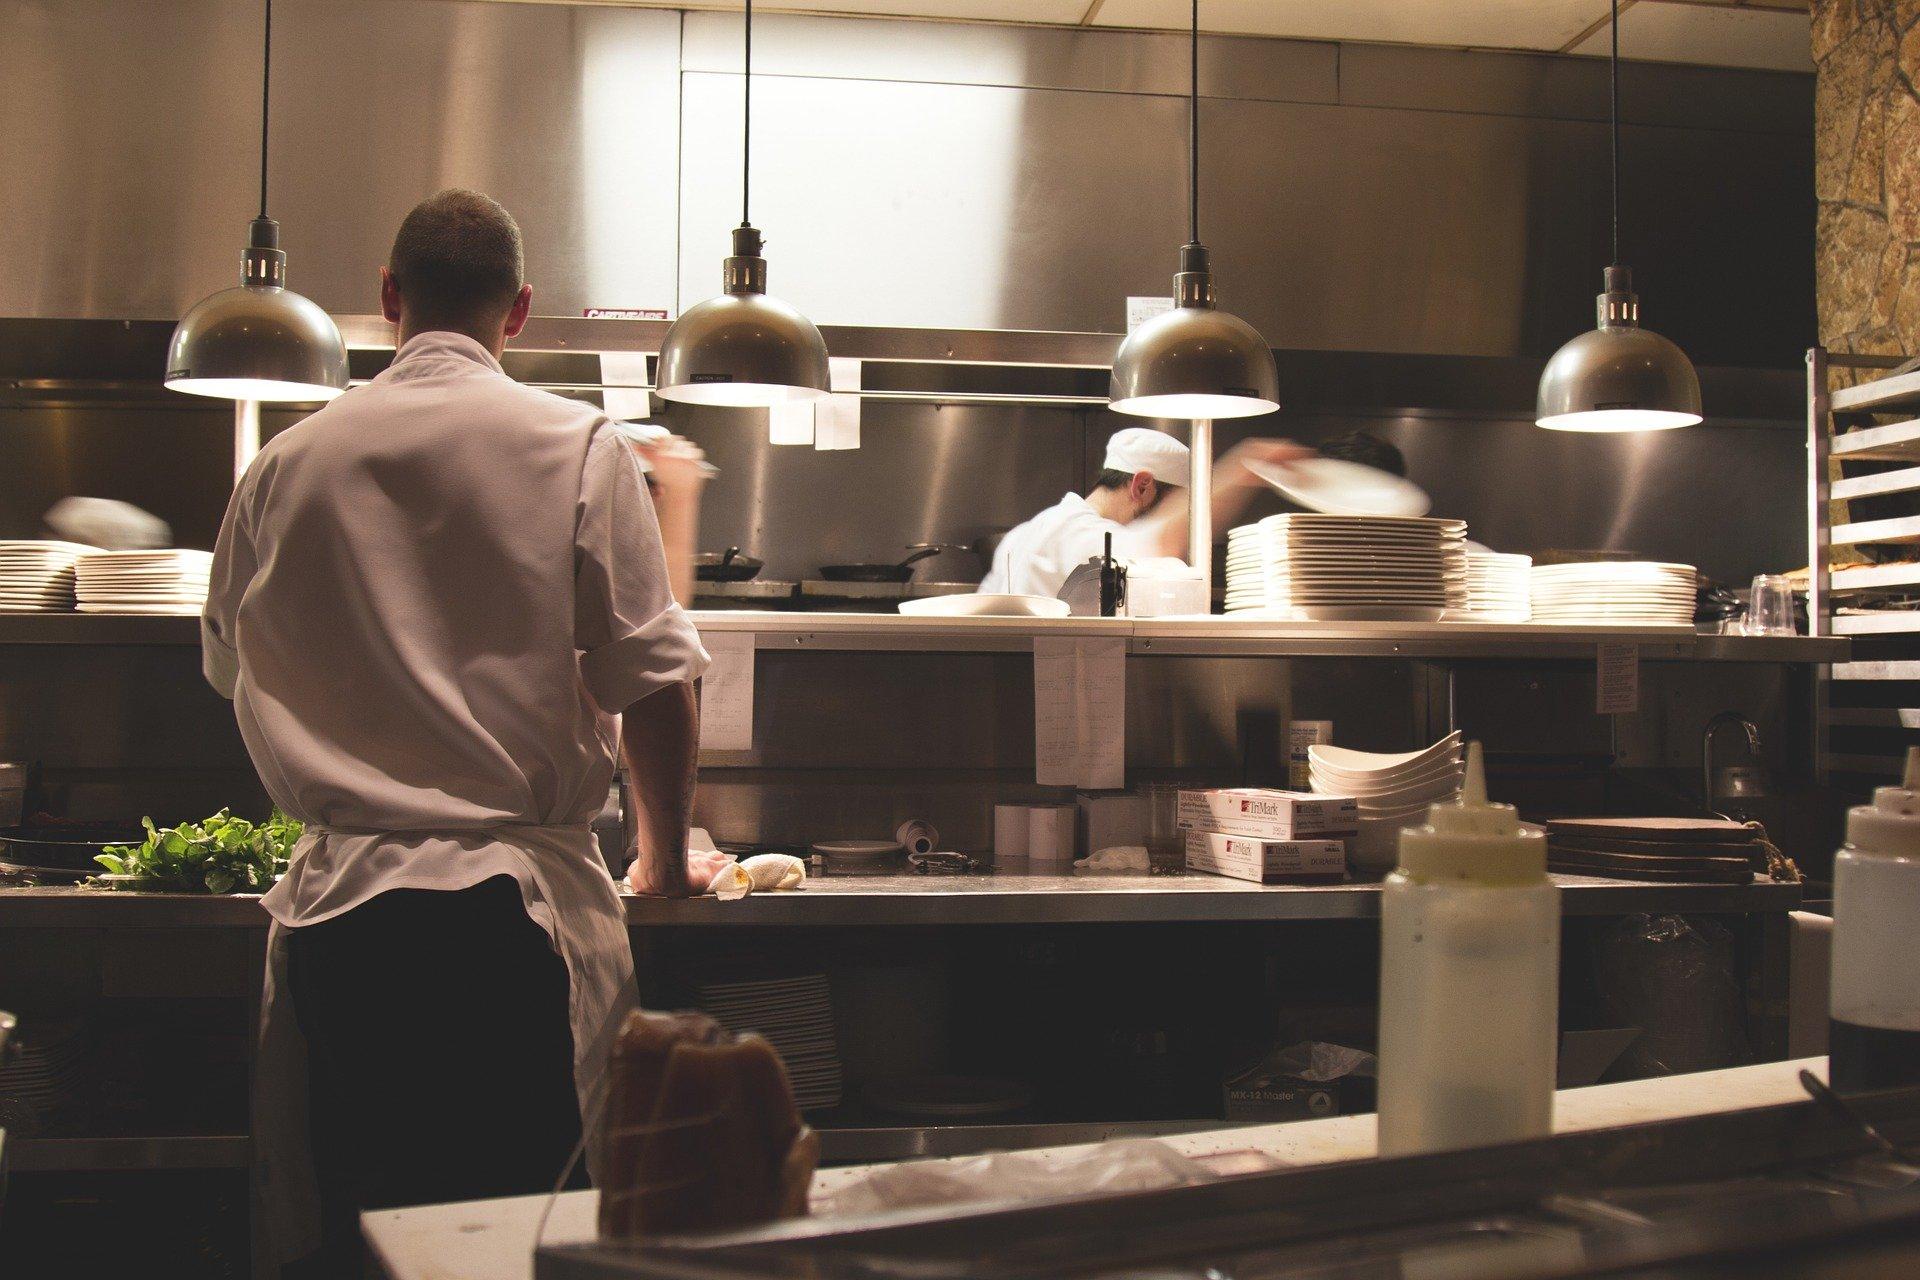 Tanz Kitchen: A New Concept